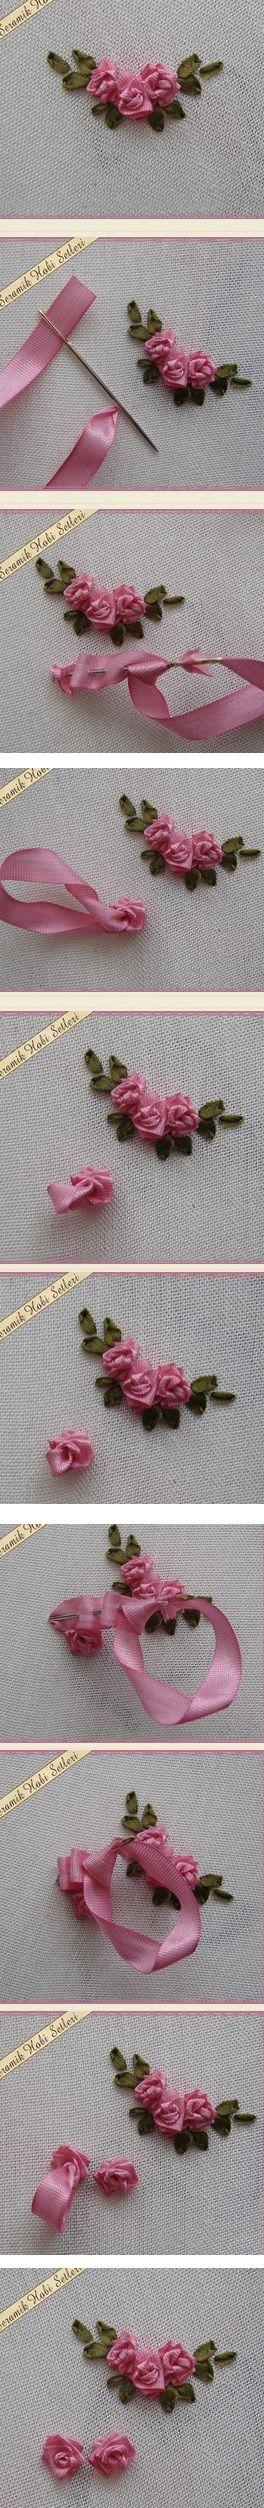 Tutorial for simple ribbon roses